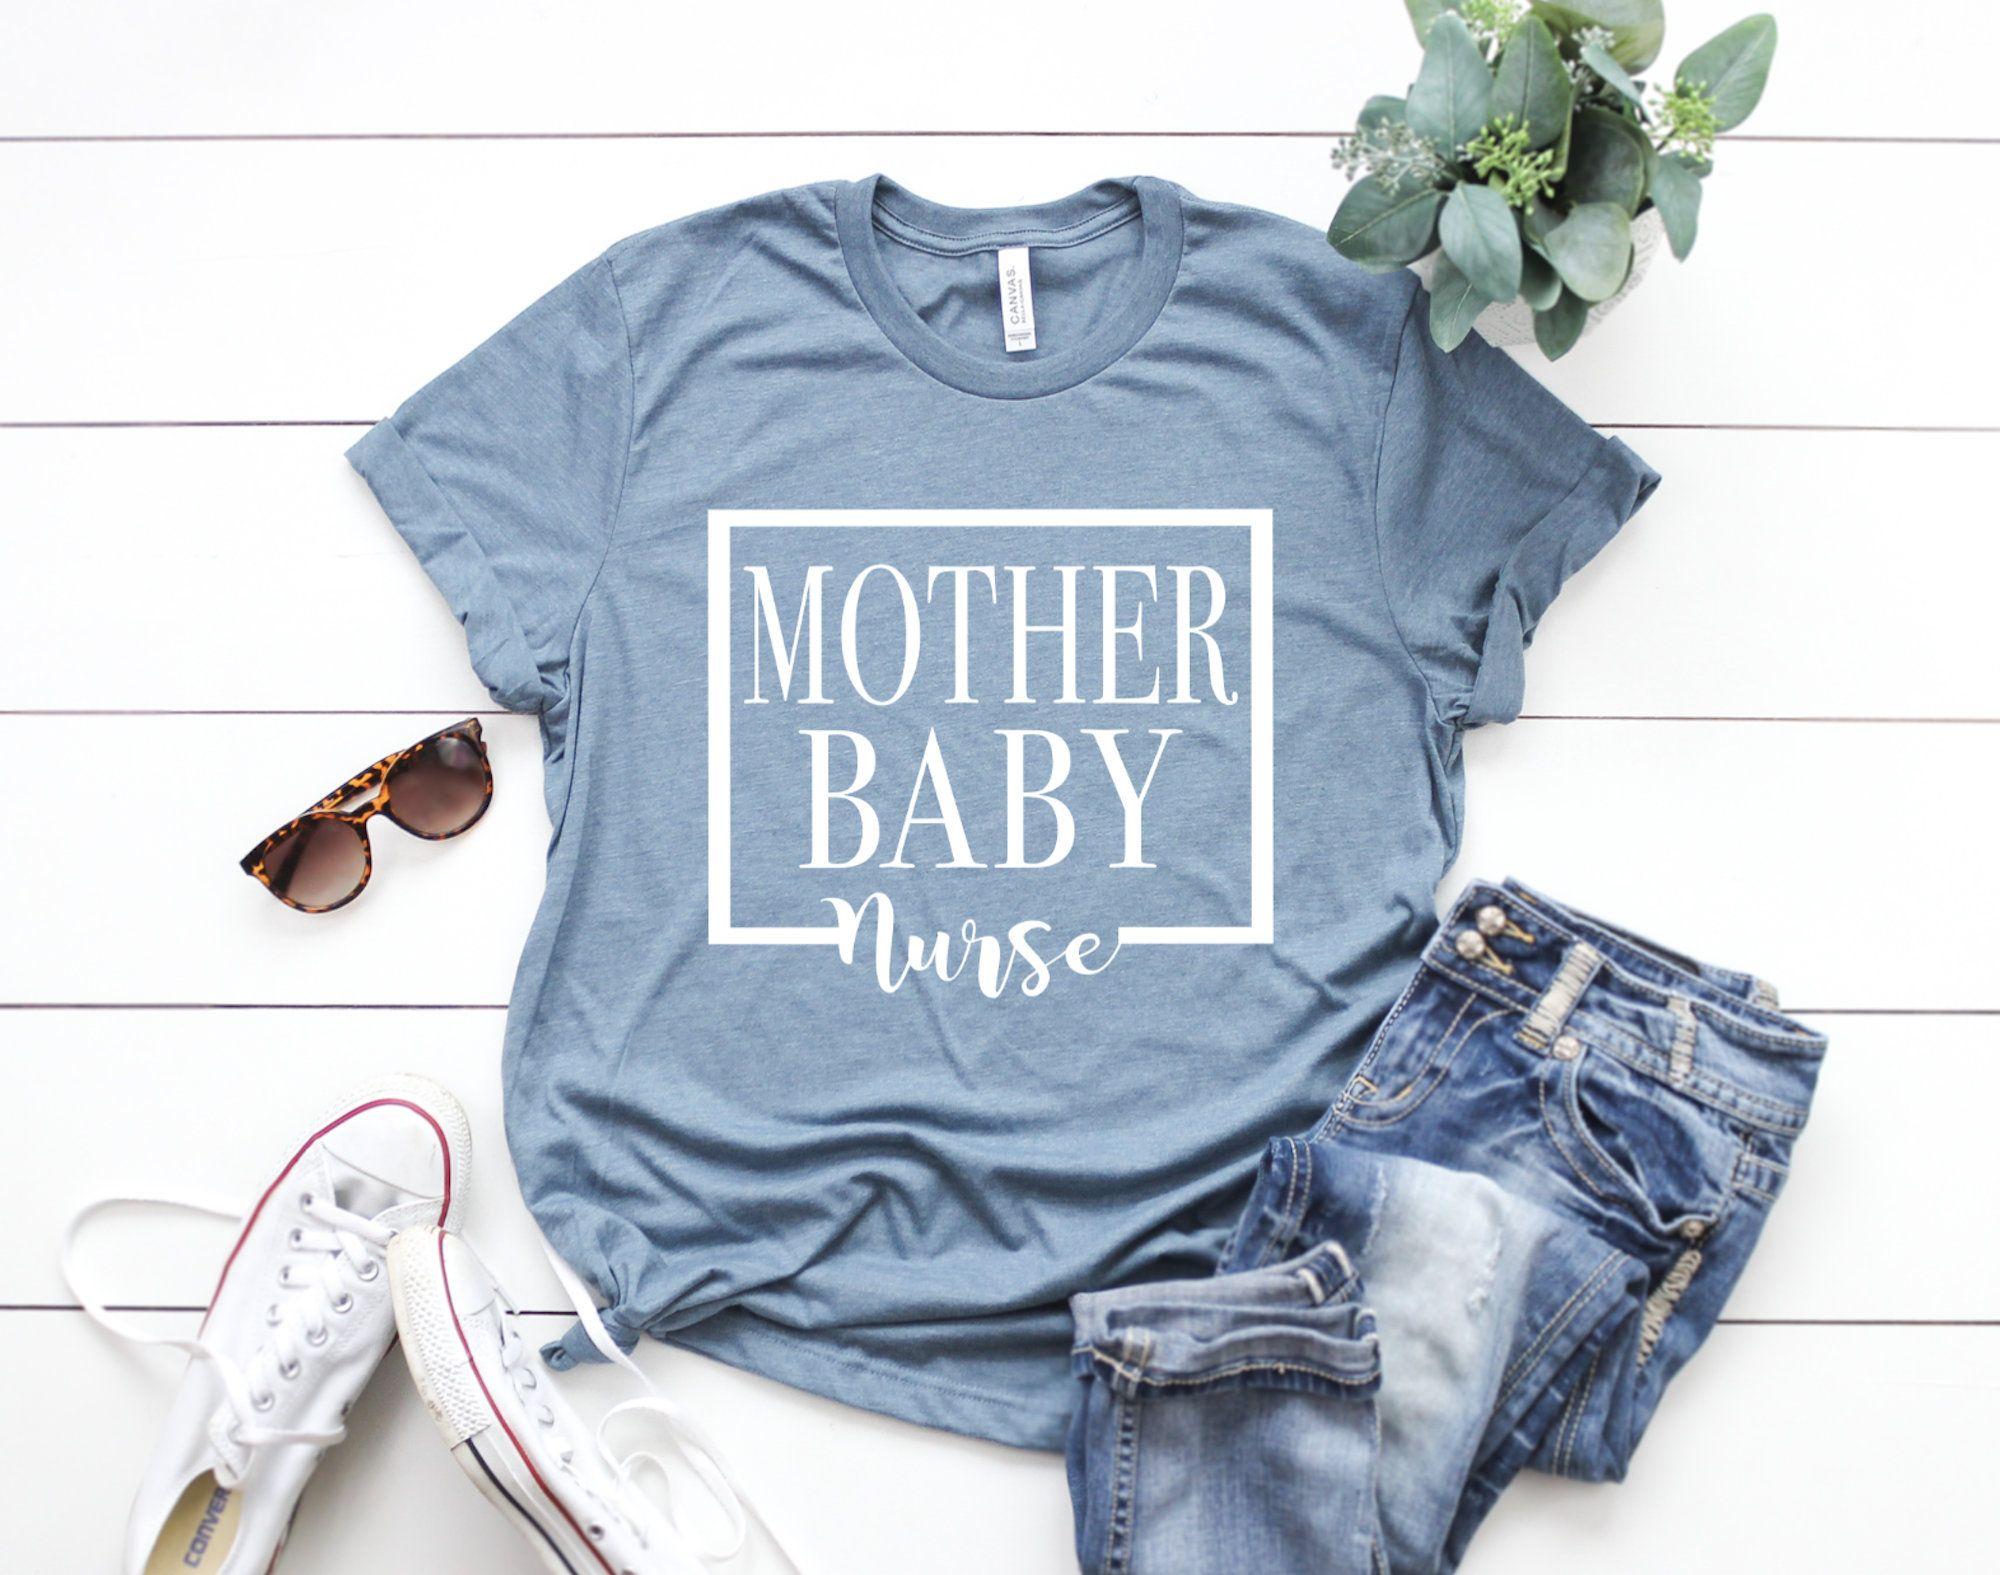 Nurse Shirts Mother Baby Nurse Baby Nurse Shirt Ob